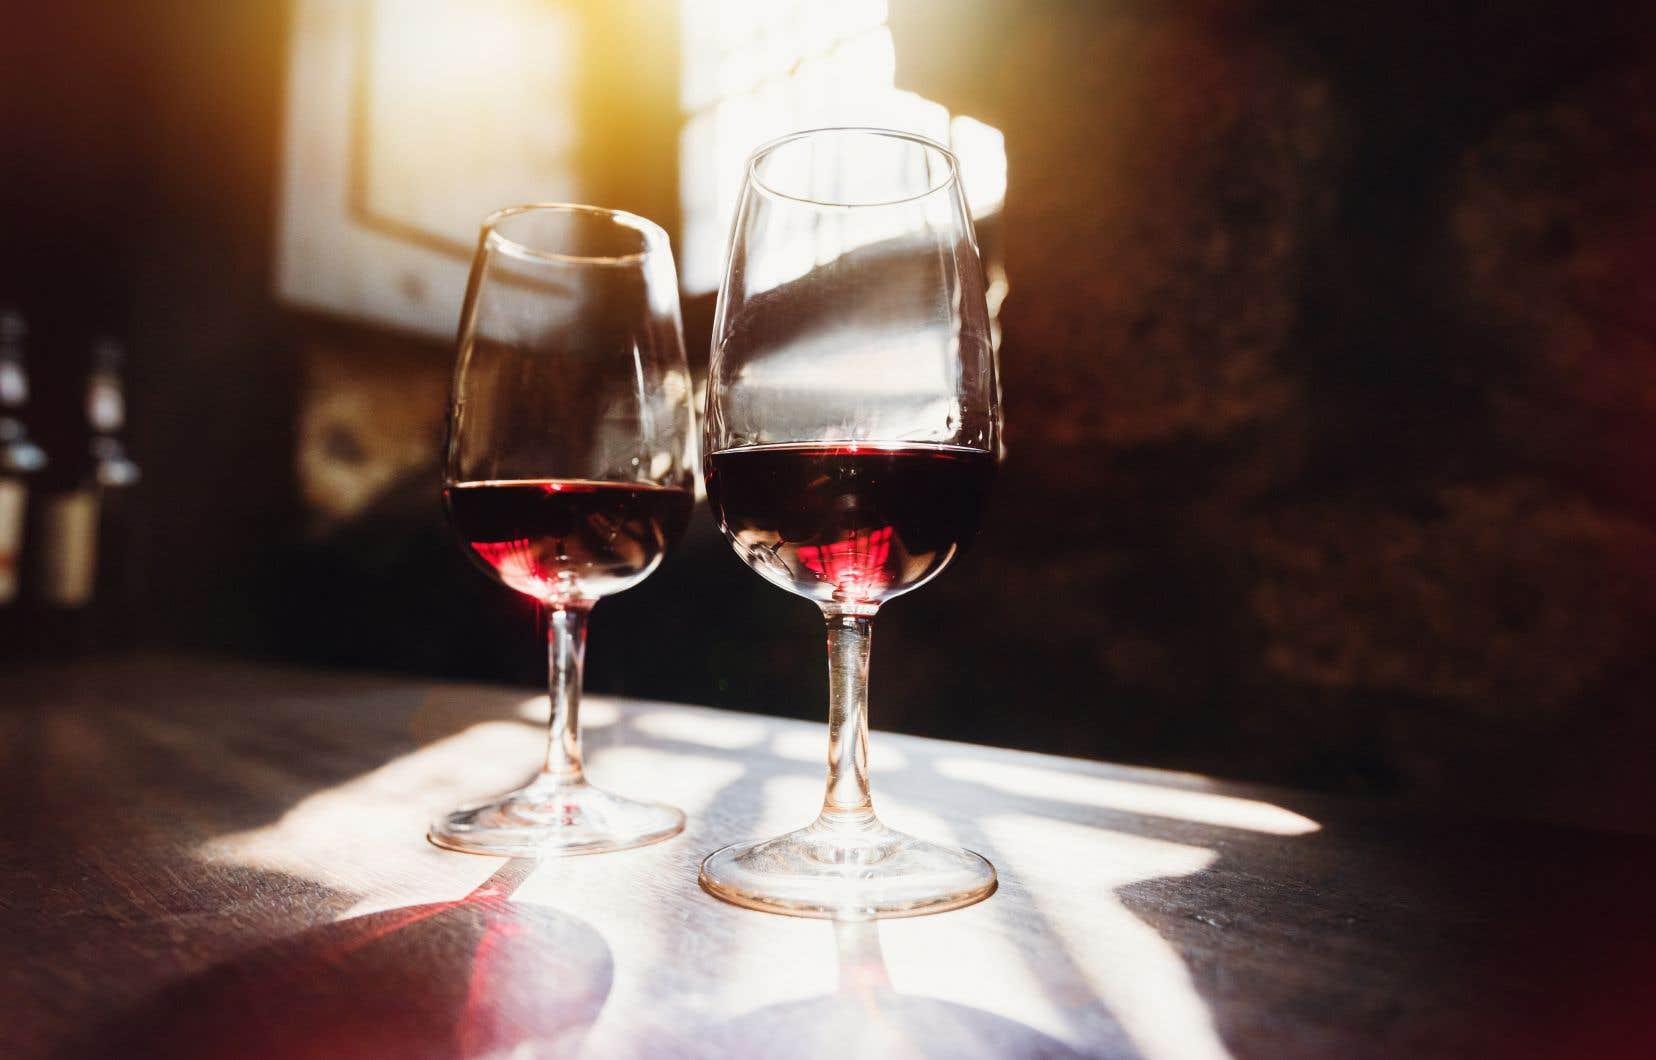 Deux vins rouges s'opposent en dégustation cette semaine.